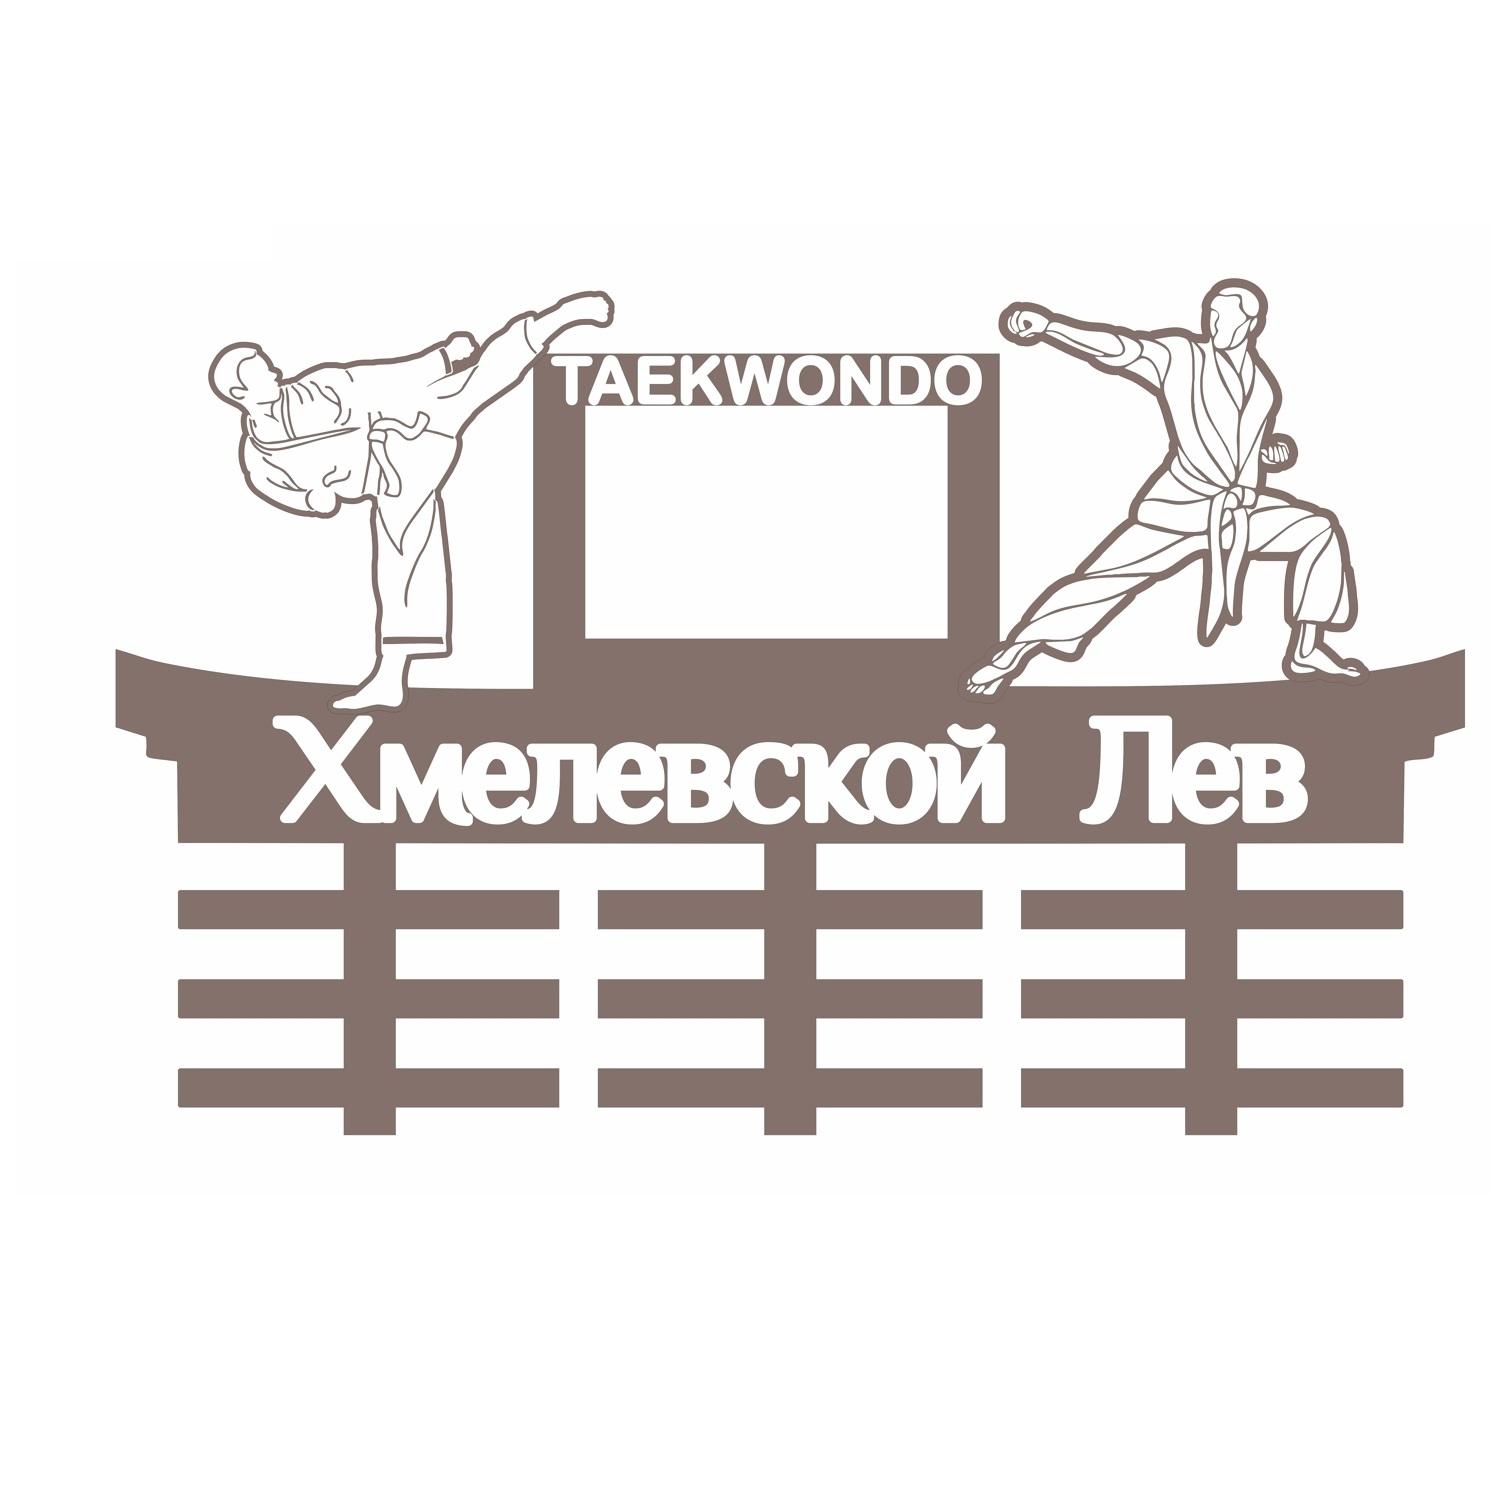 Laser Cut Taekwondo Medal Holder Martial Arts Medal Display Free CDR Vectors Art